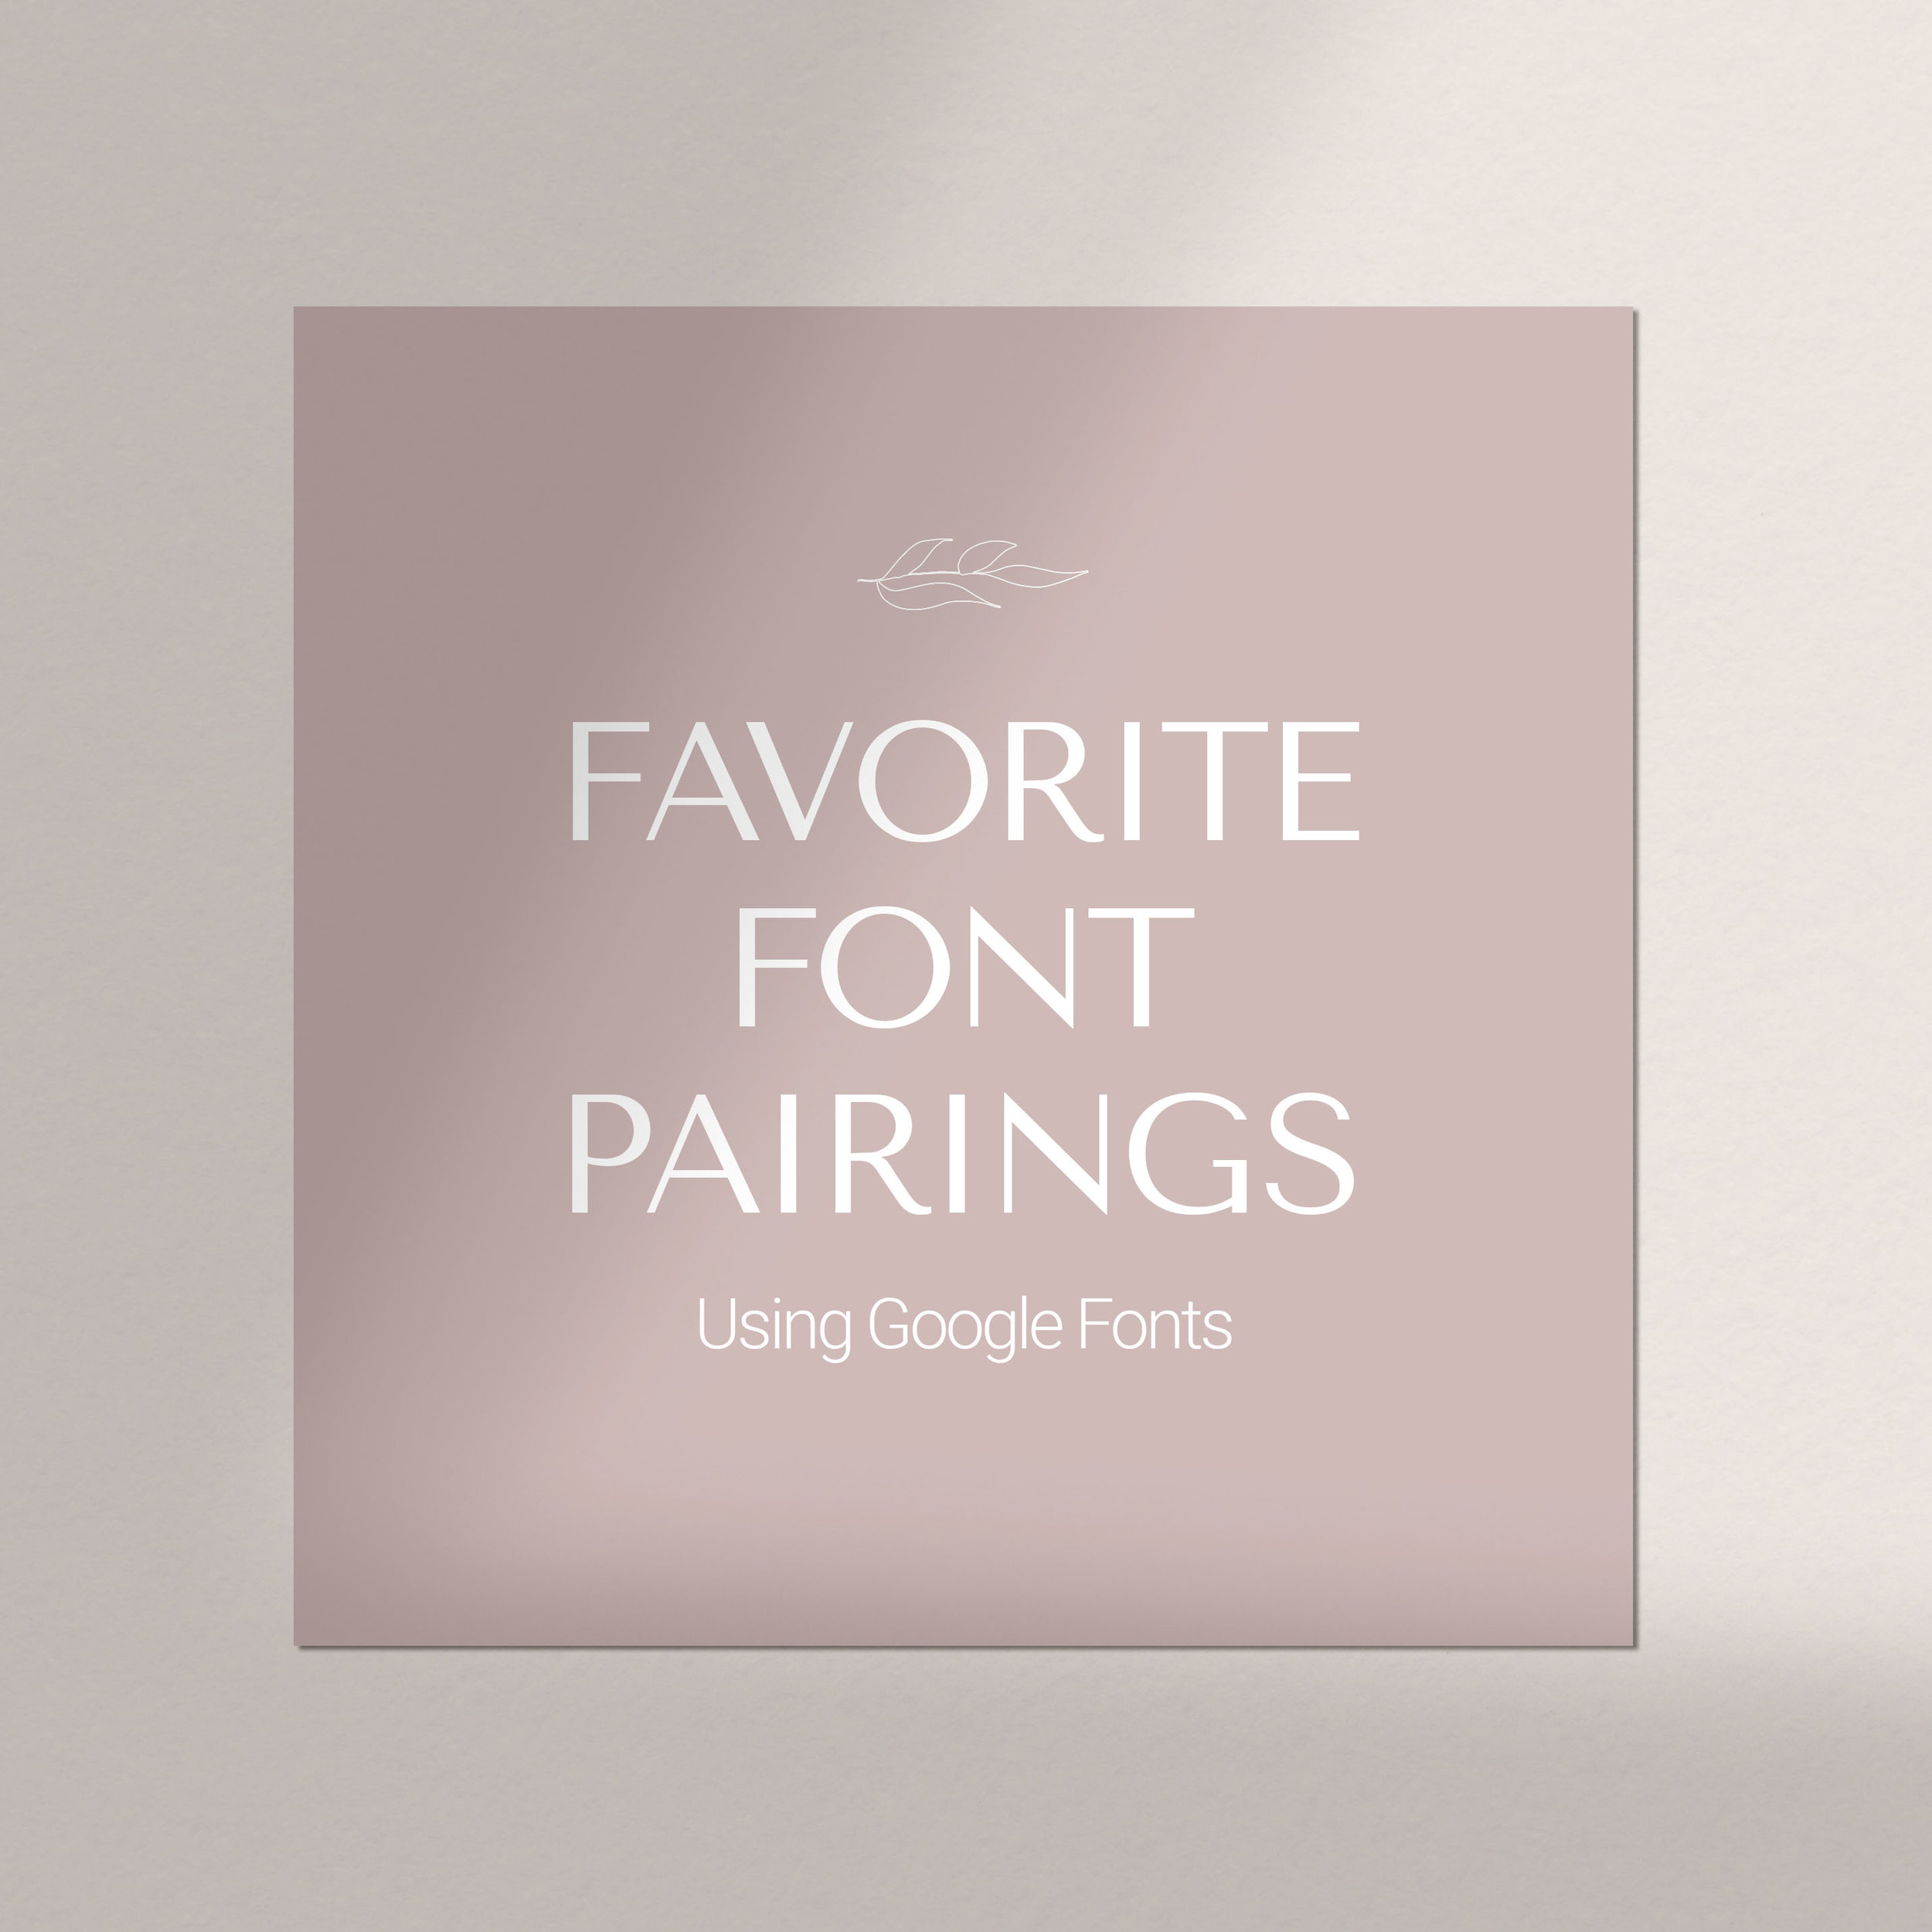 FavoriteFontPairings_Social_PostHeader.jpg